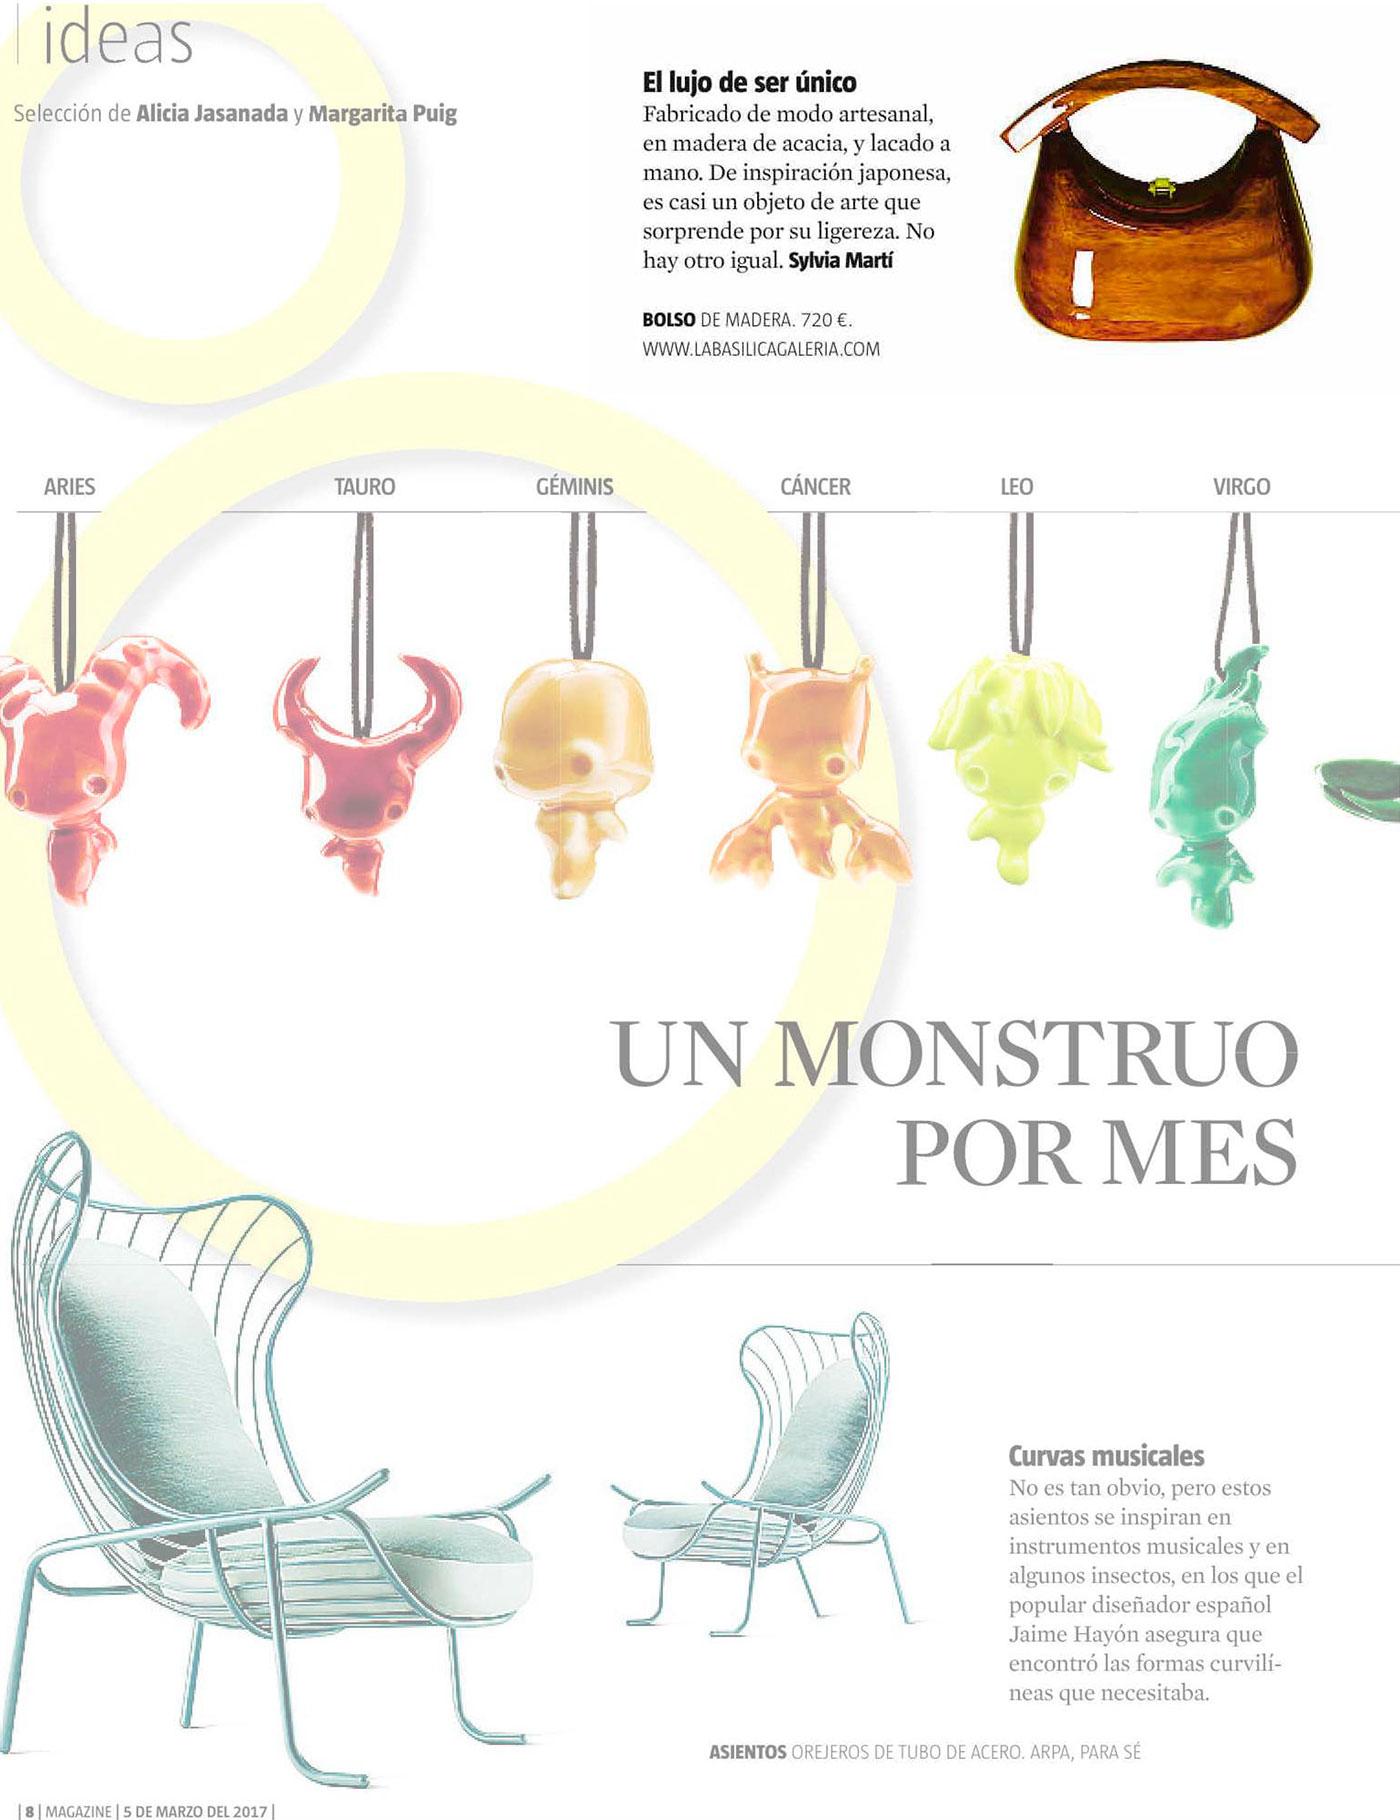 LBG Magazine La Vanguardia 5 03 2017 1 - Prensa